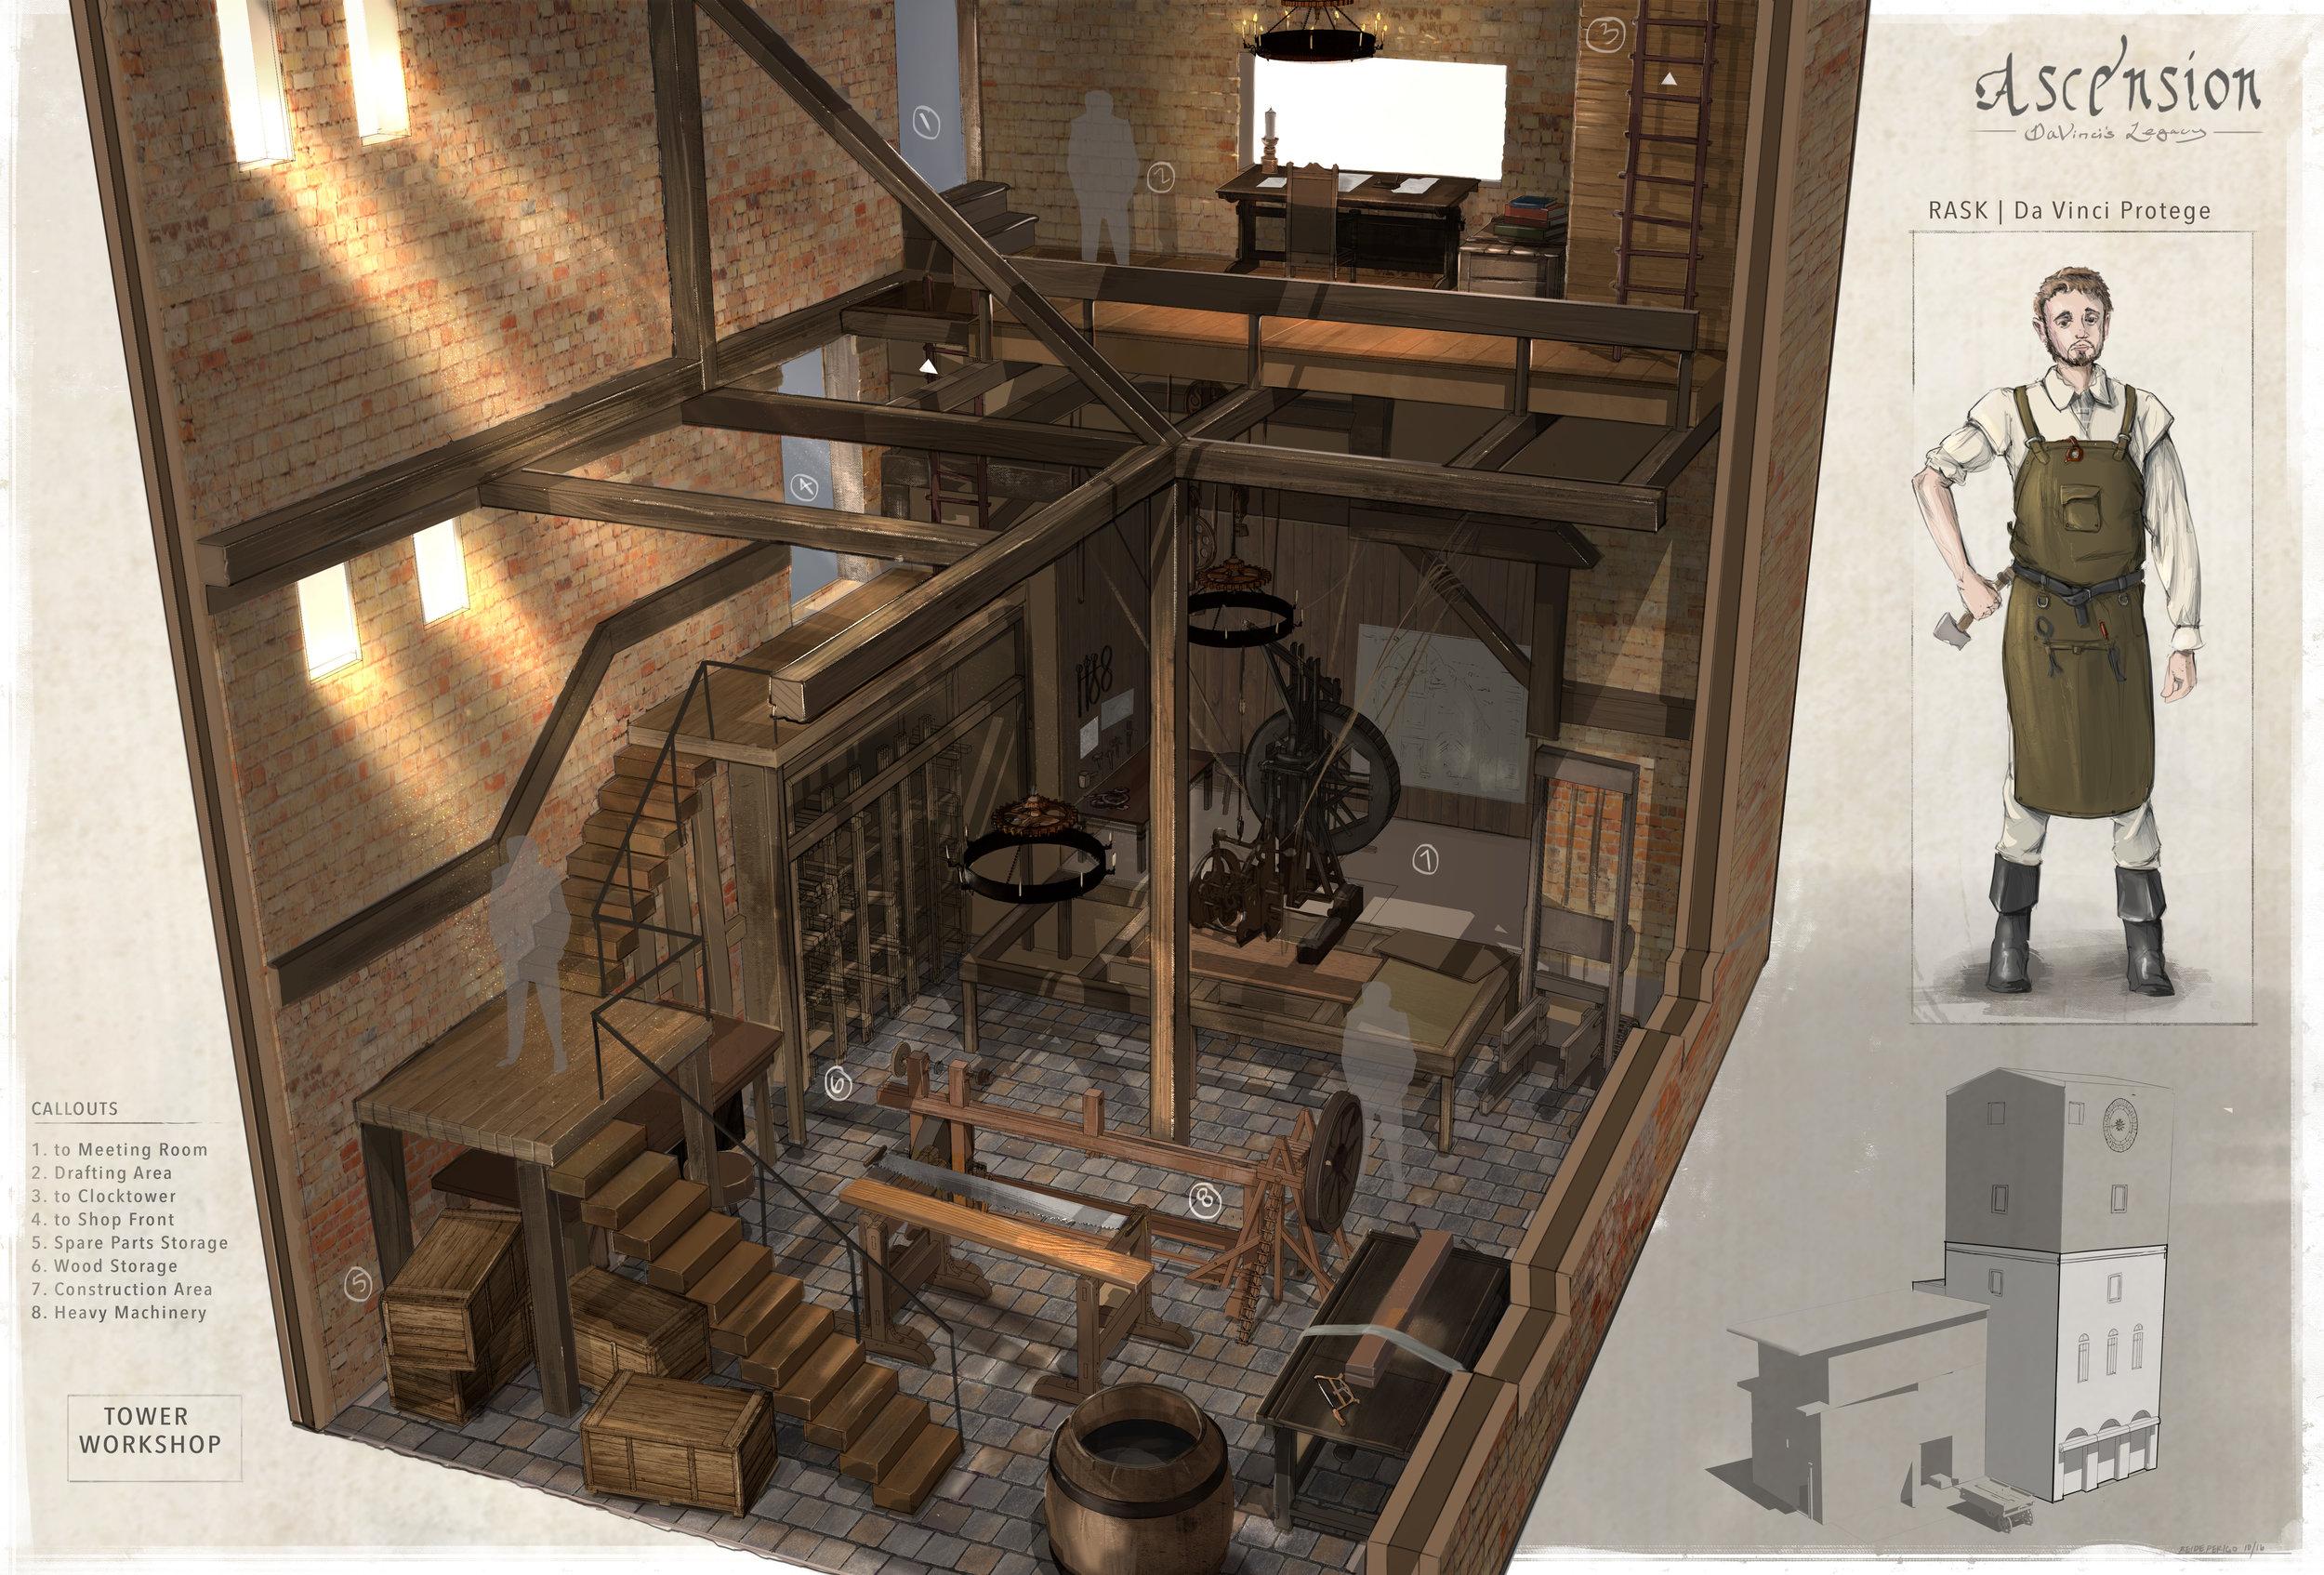 Tower Workshop